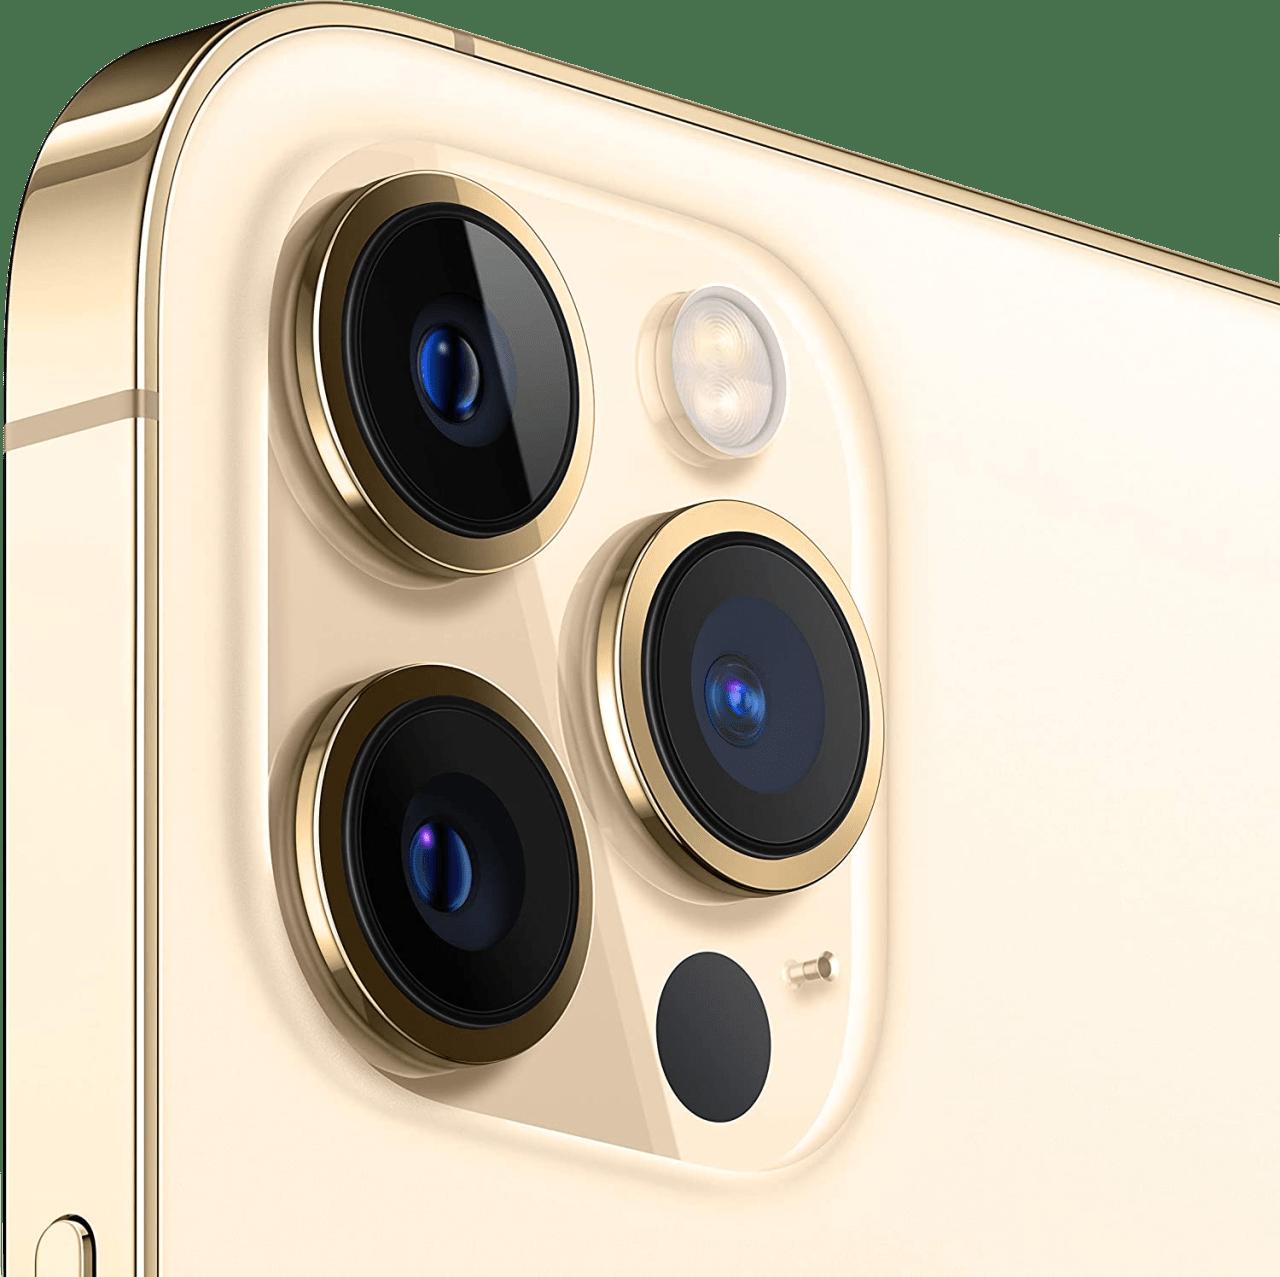 Gold Apple iPhone 12 Pro 512GB.2